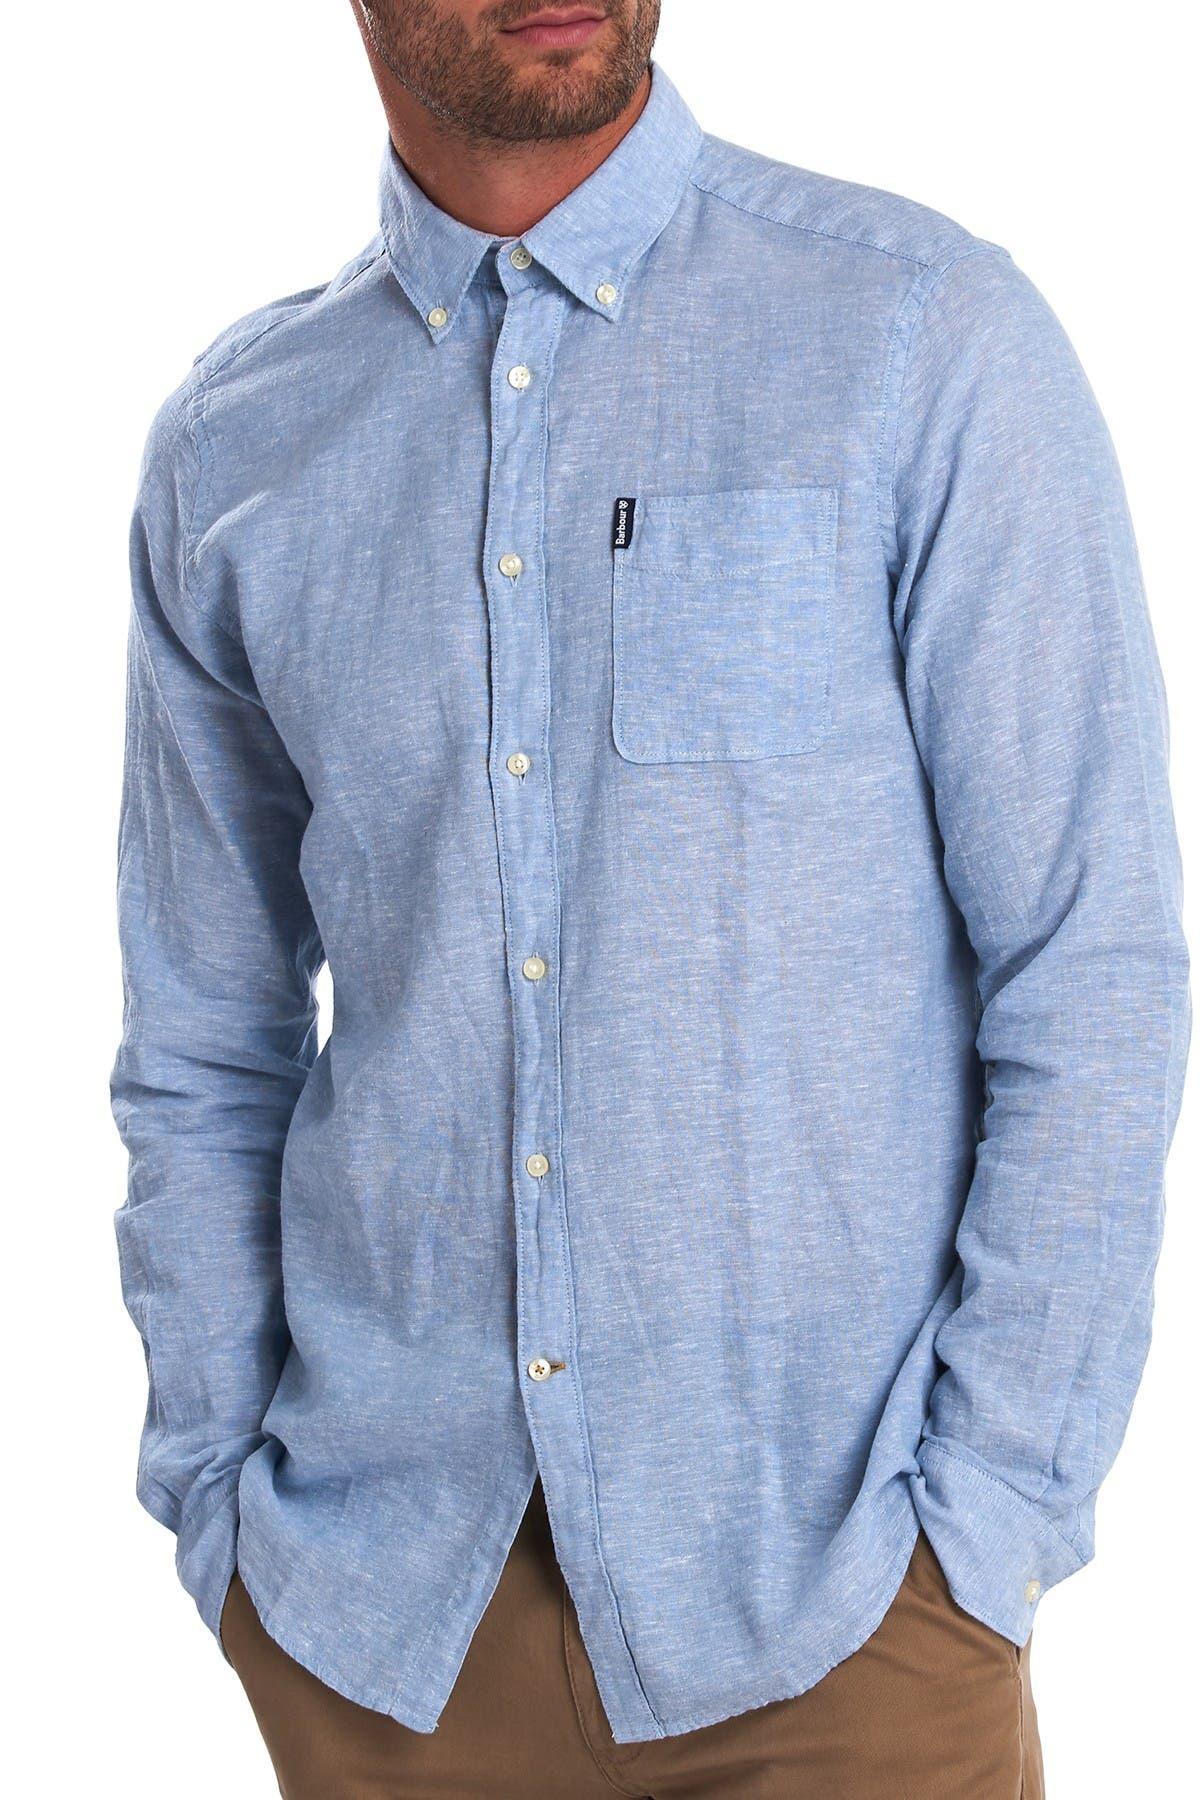 Image of Barbour Miltan Regular Fit Linen Blend Shirt